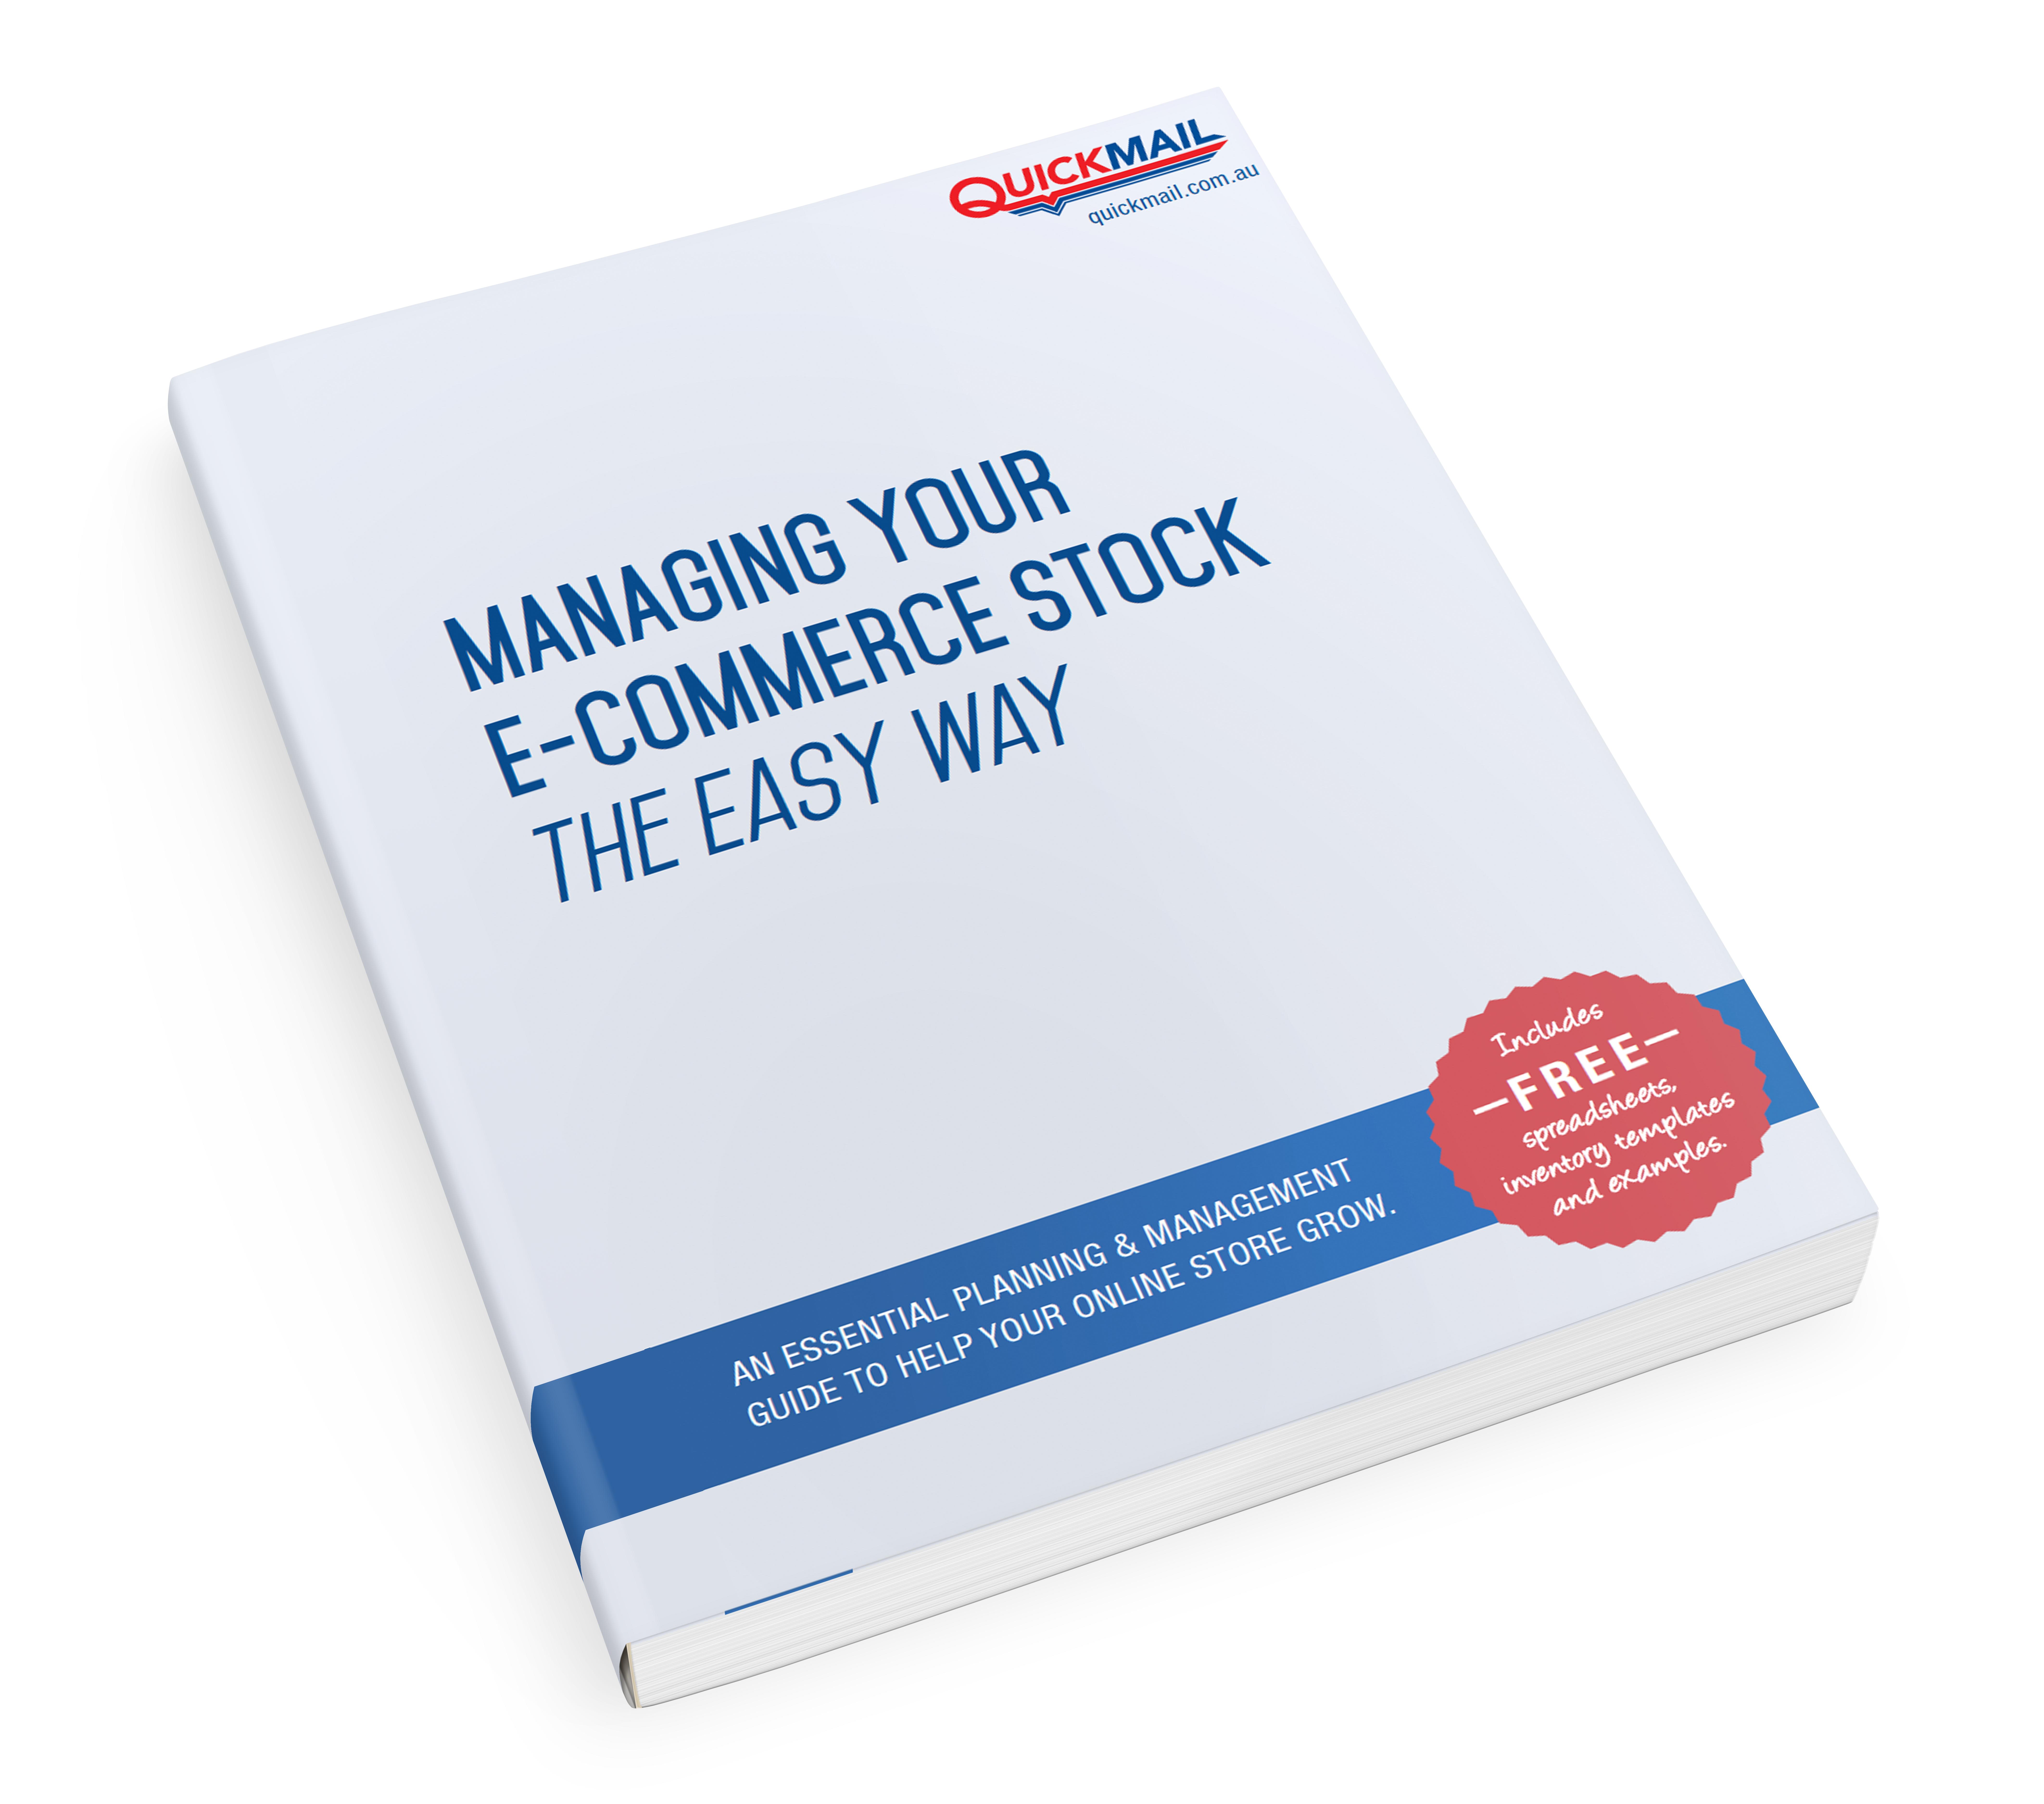 Stock Management e-guide